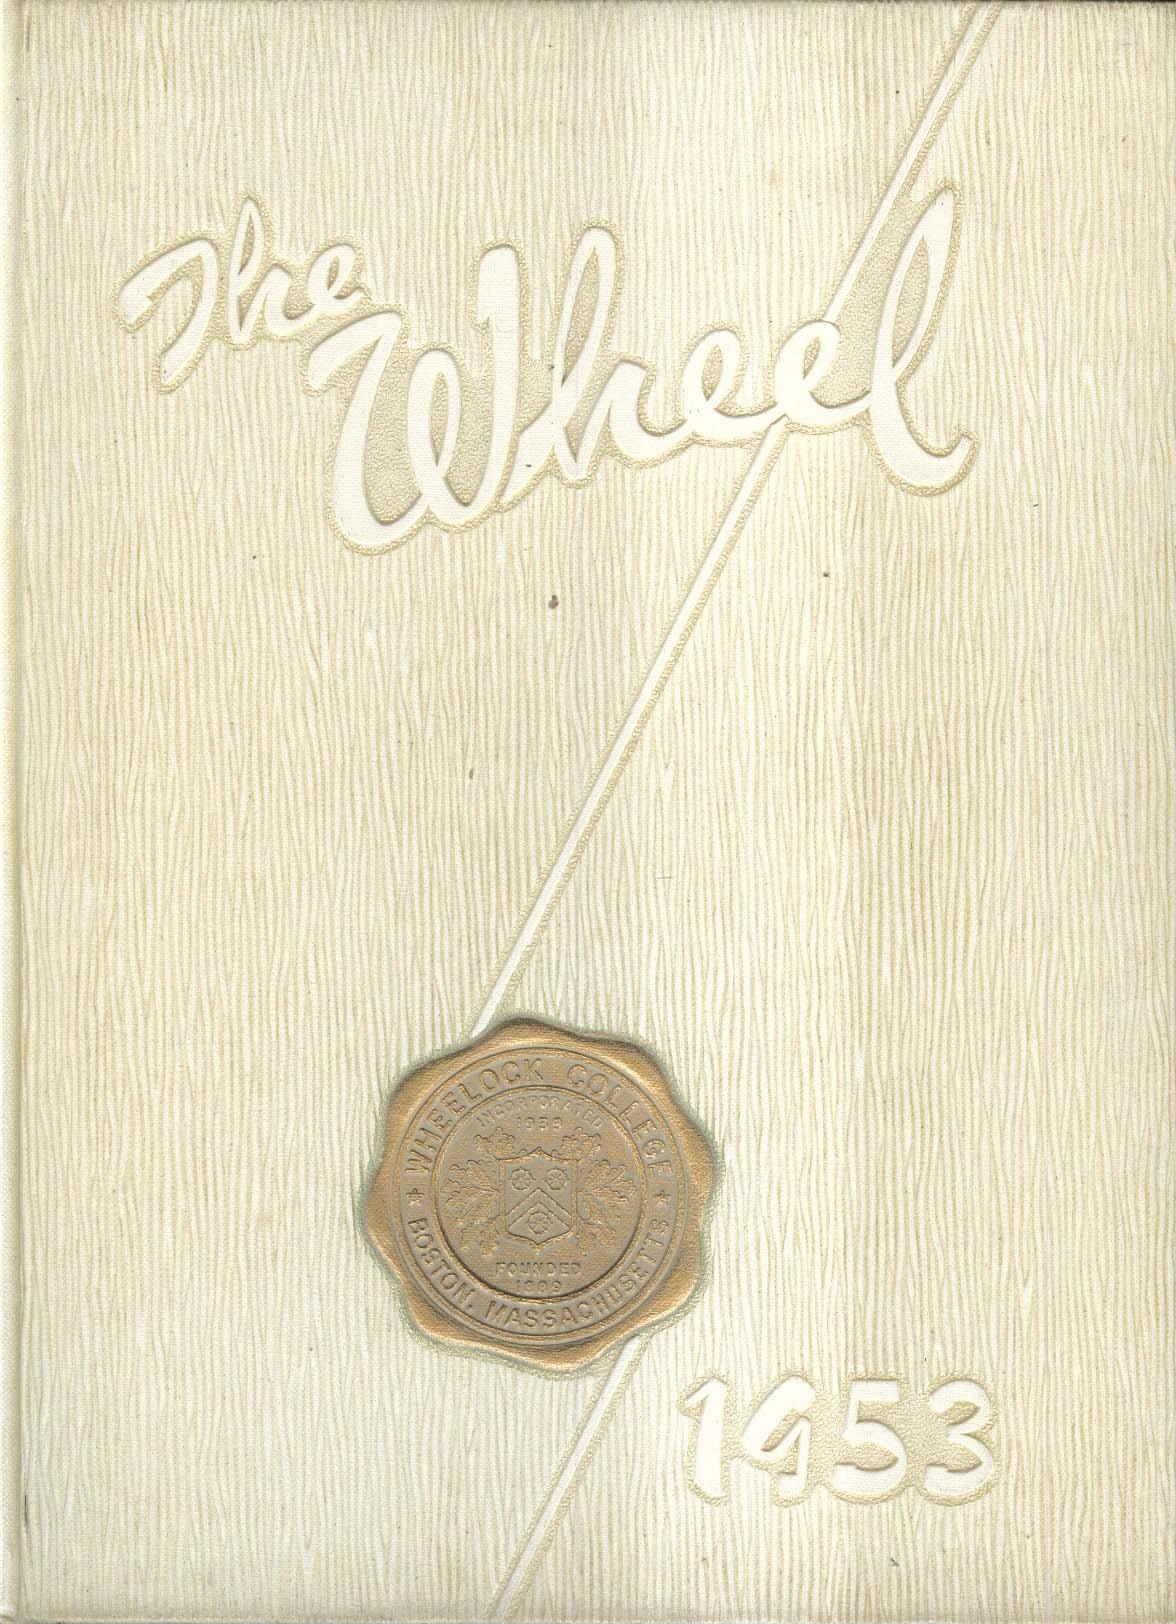 Image for The Wheel 1953 Wheelock College Boston Massachusetts MA Yearbook